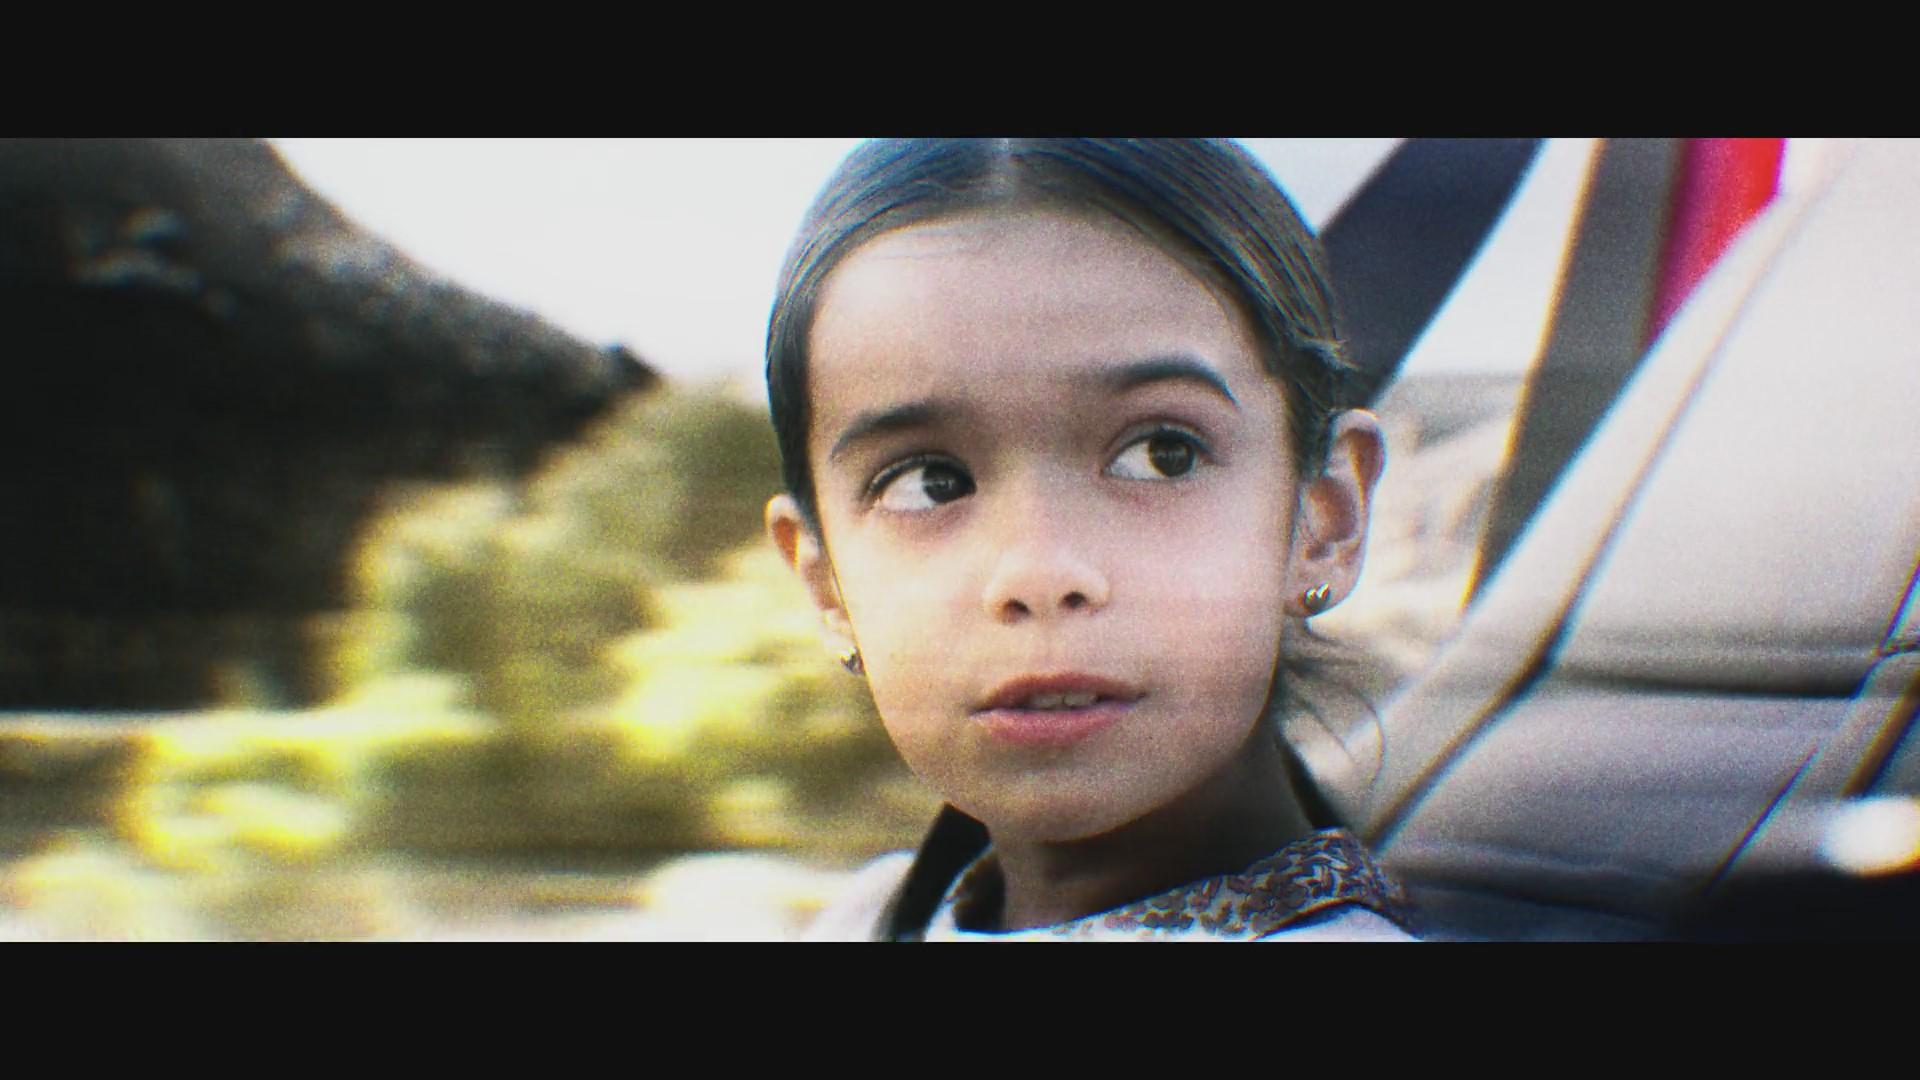 Valentina Mandala in The Babysitter: Killer Queen (2020)